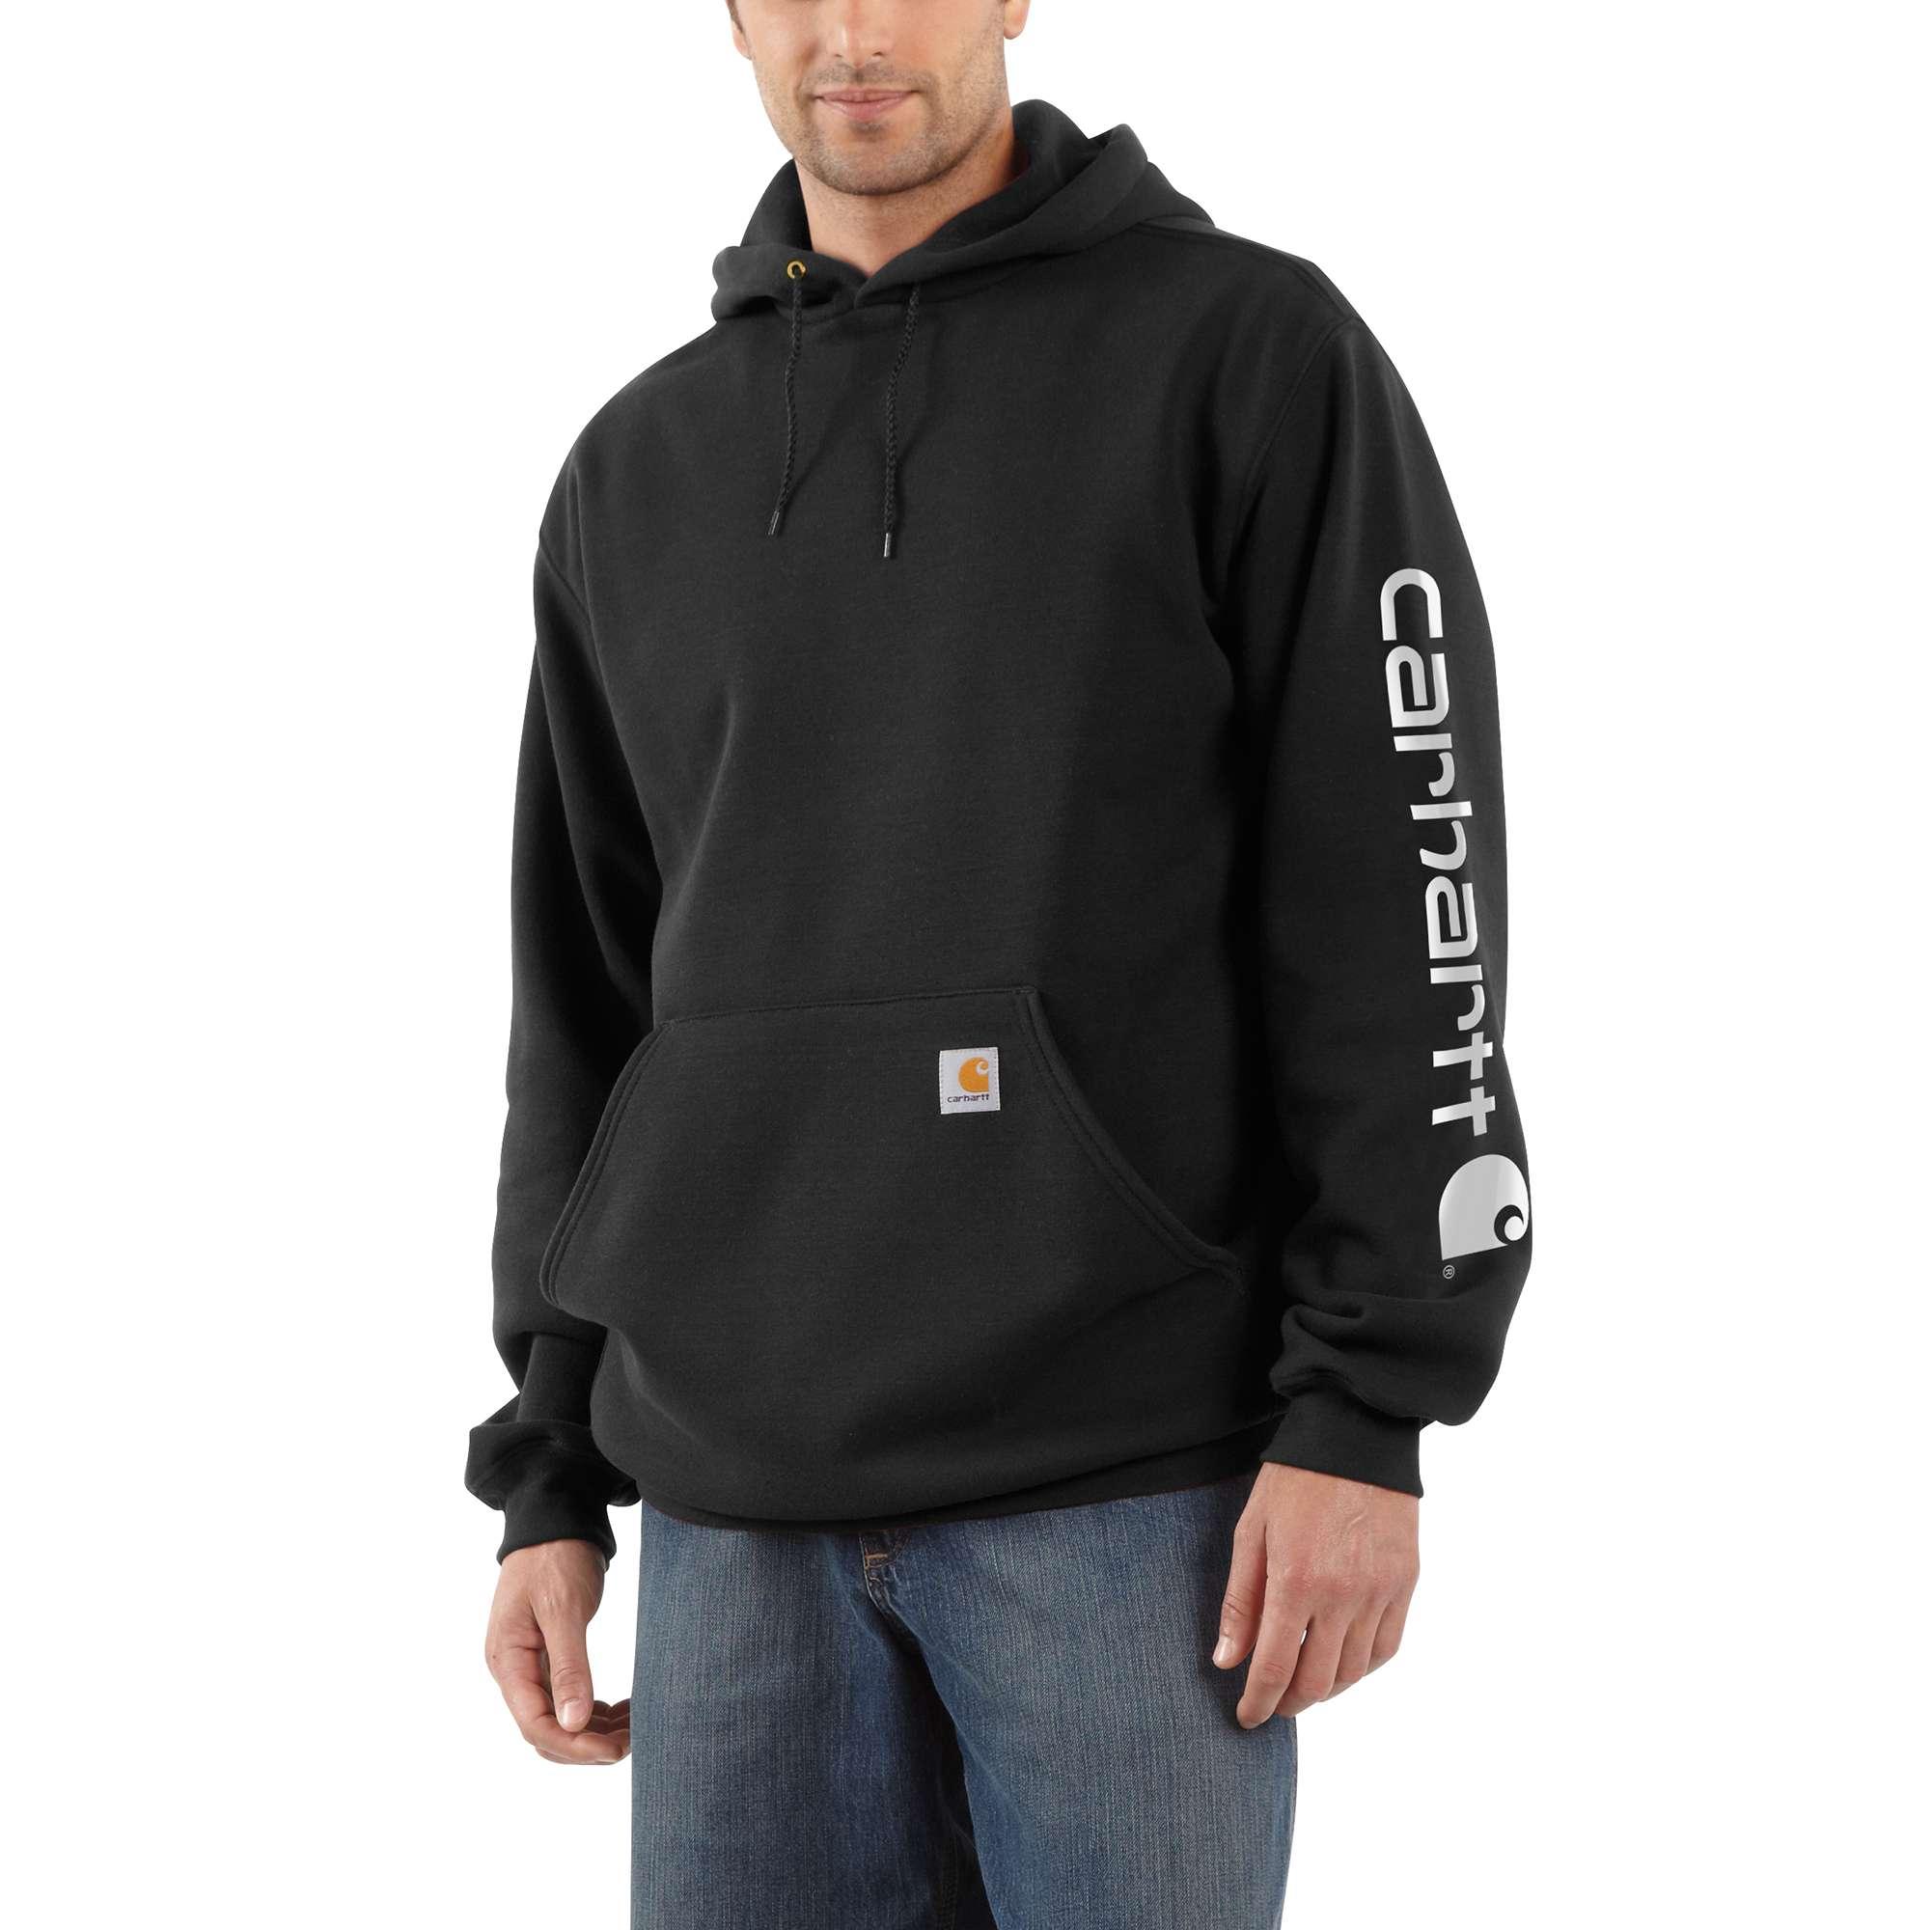 Men's Signature Sleeve Logo Hooded Sweatshirt, Black, swatch